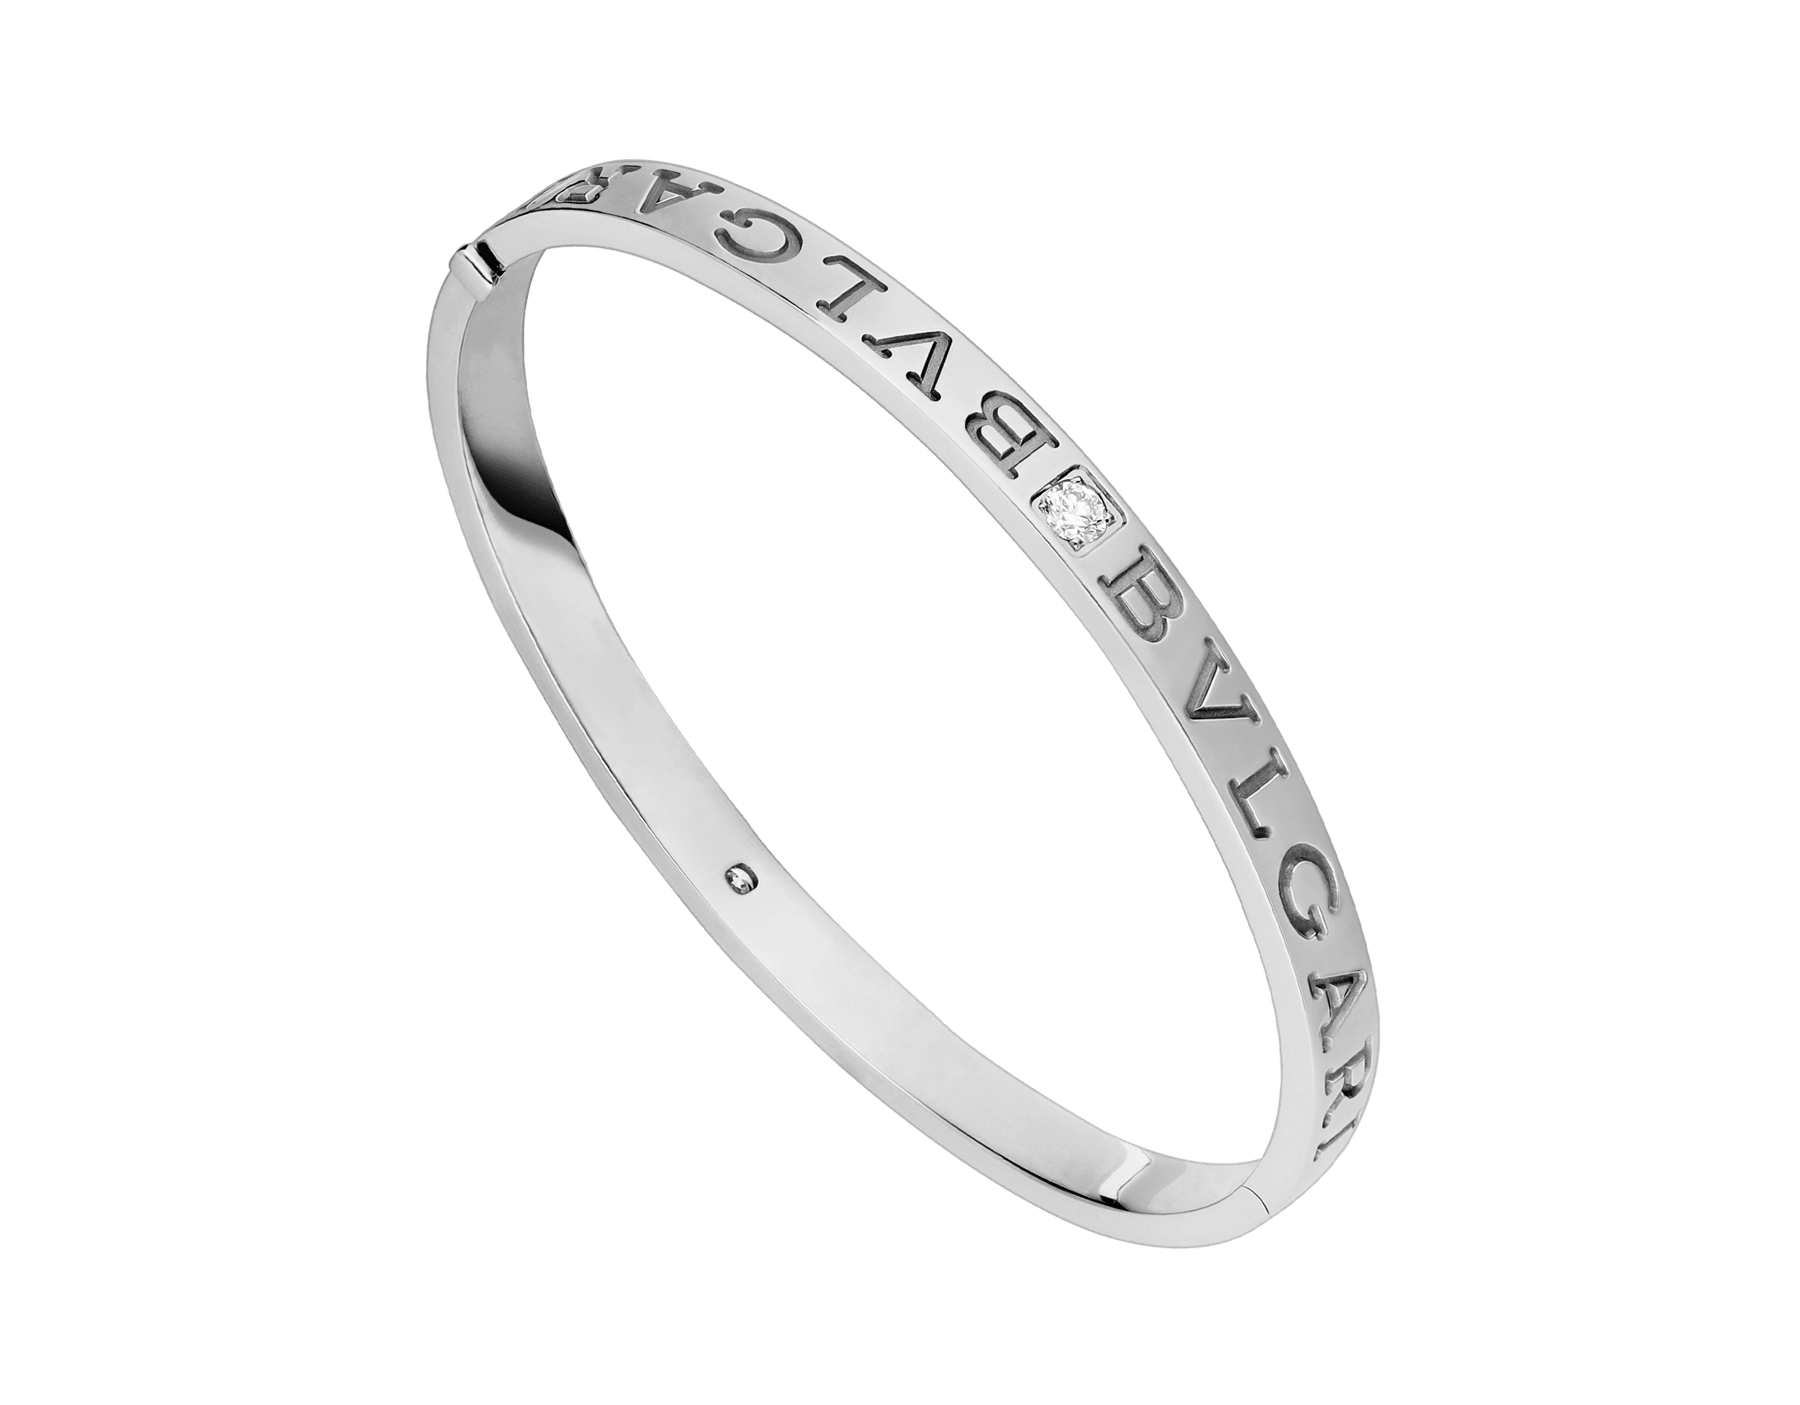 Bracelet jonc BVLGARI BVLGARI en or blanc 18K serti de diamants BR856790 image 1